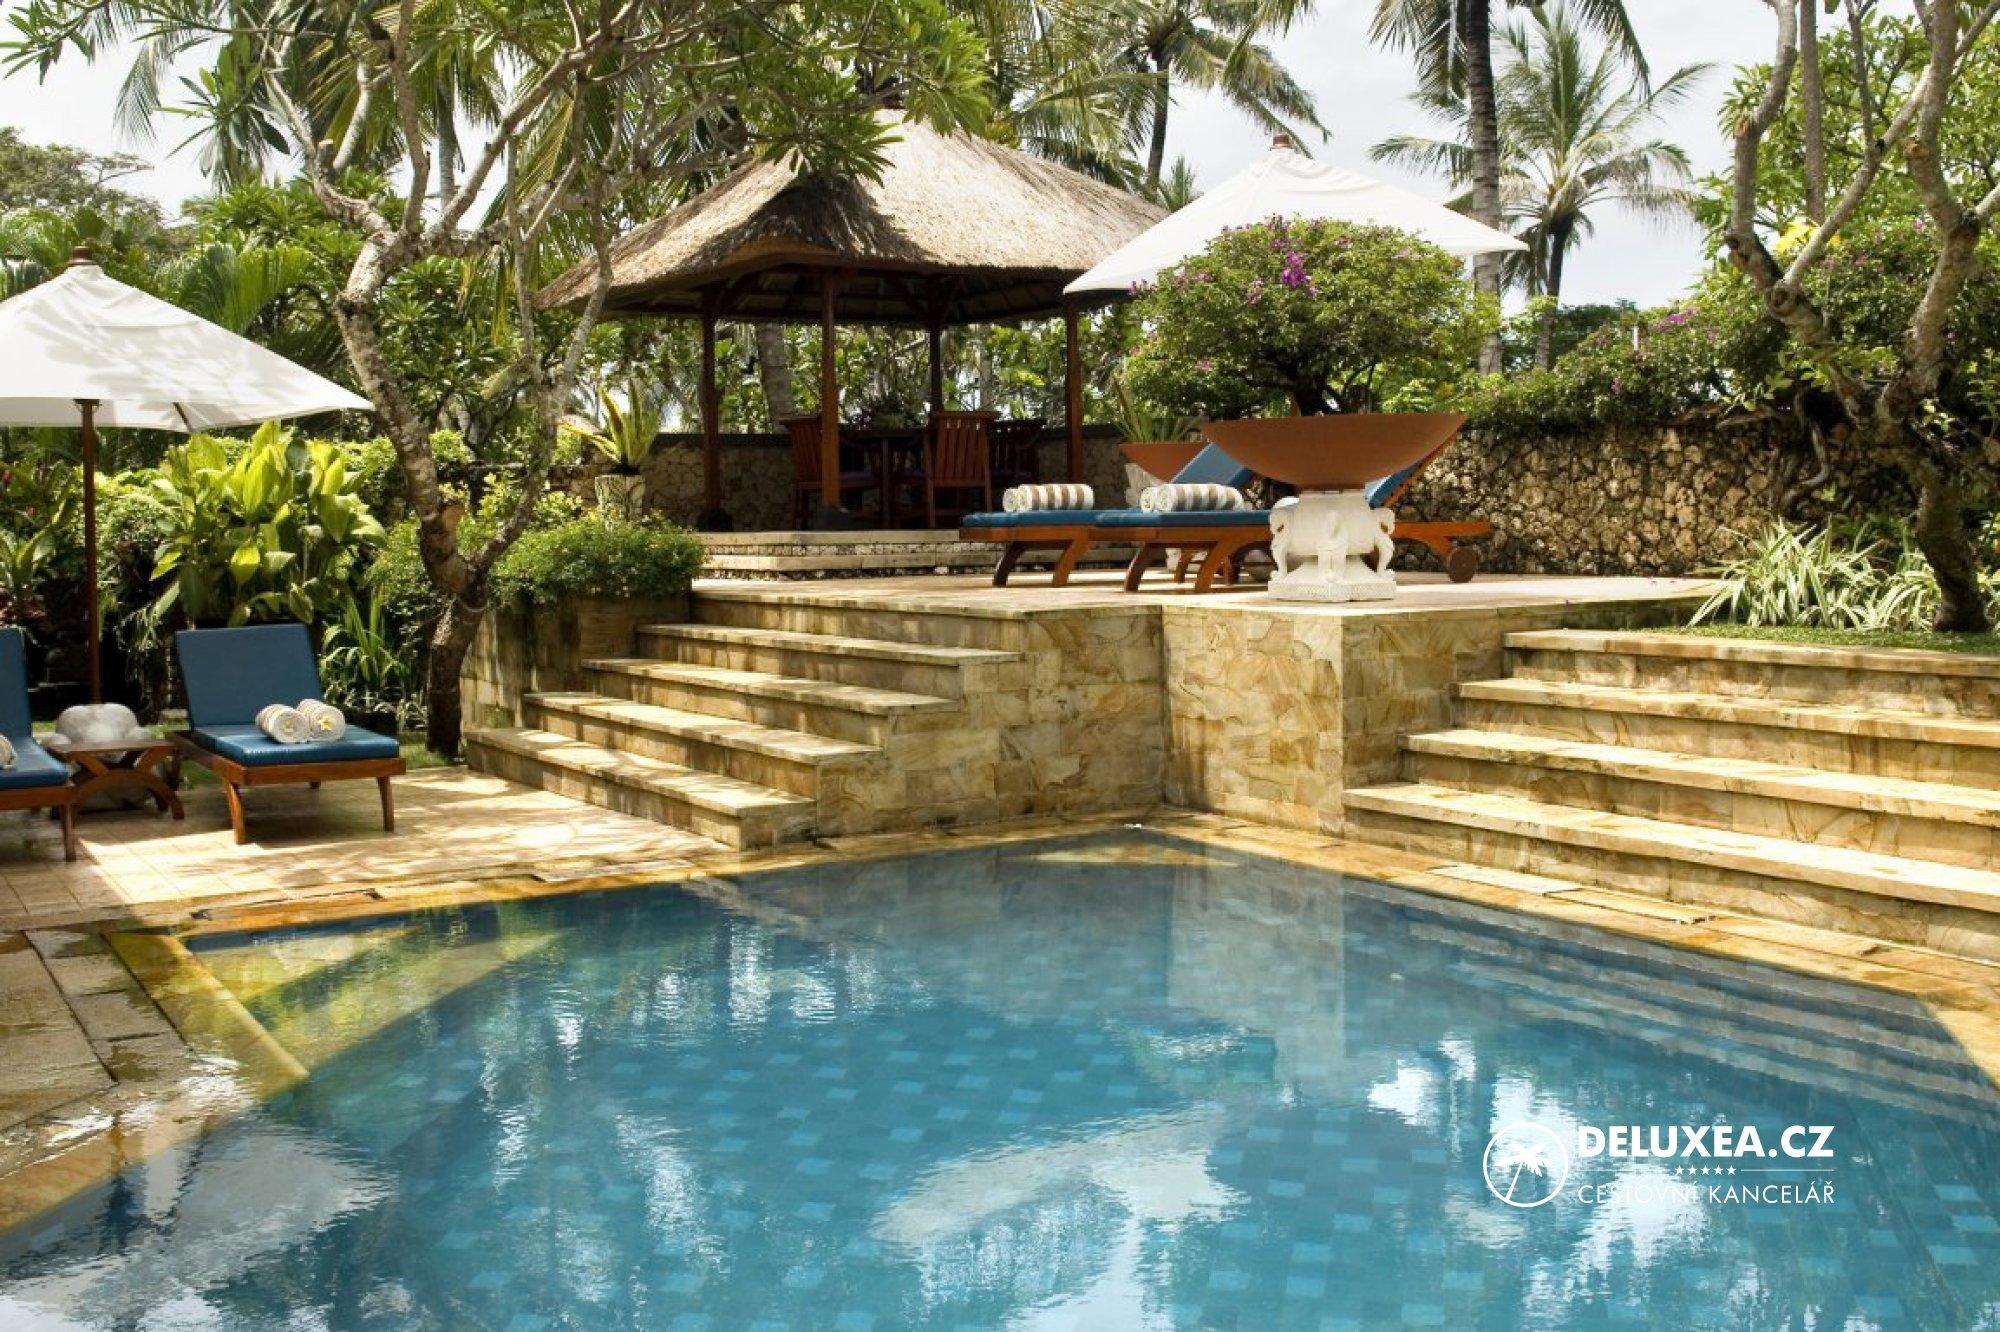 hotel nusa dua beach hotel bali deluxea. Black Bedroom Furniture Sets. Home Design Ideas